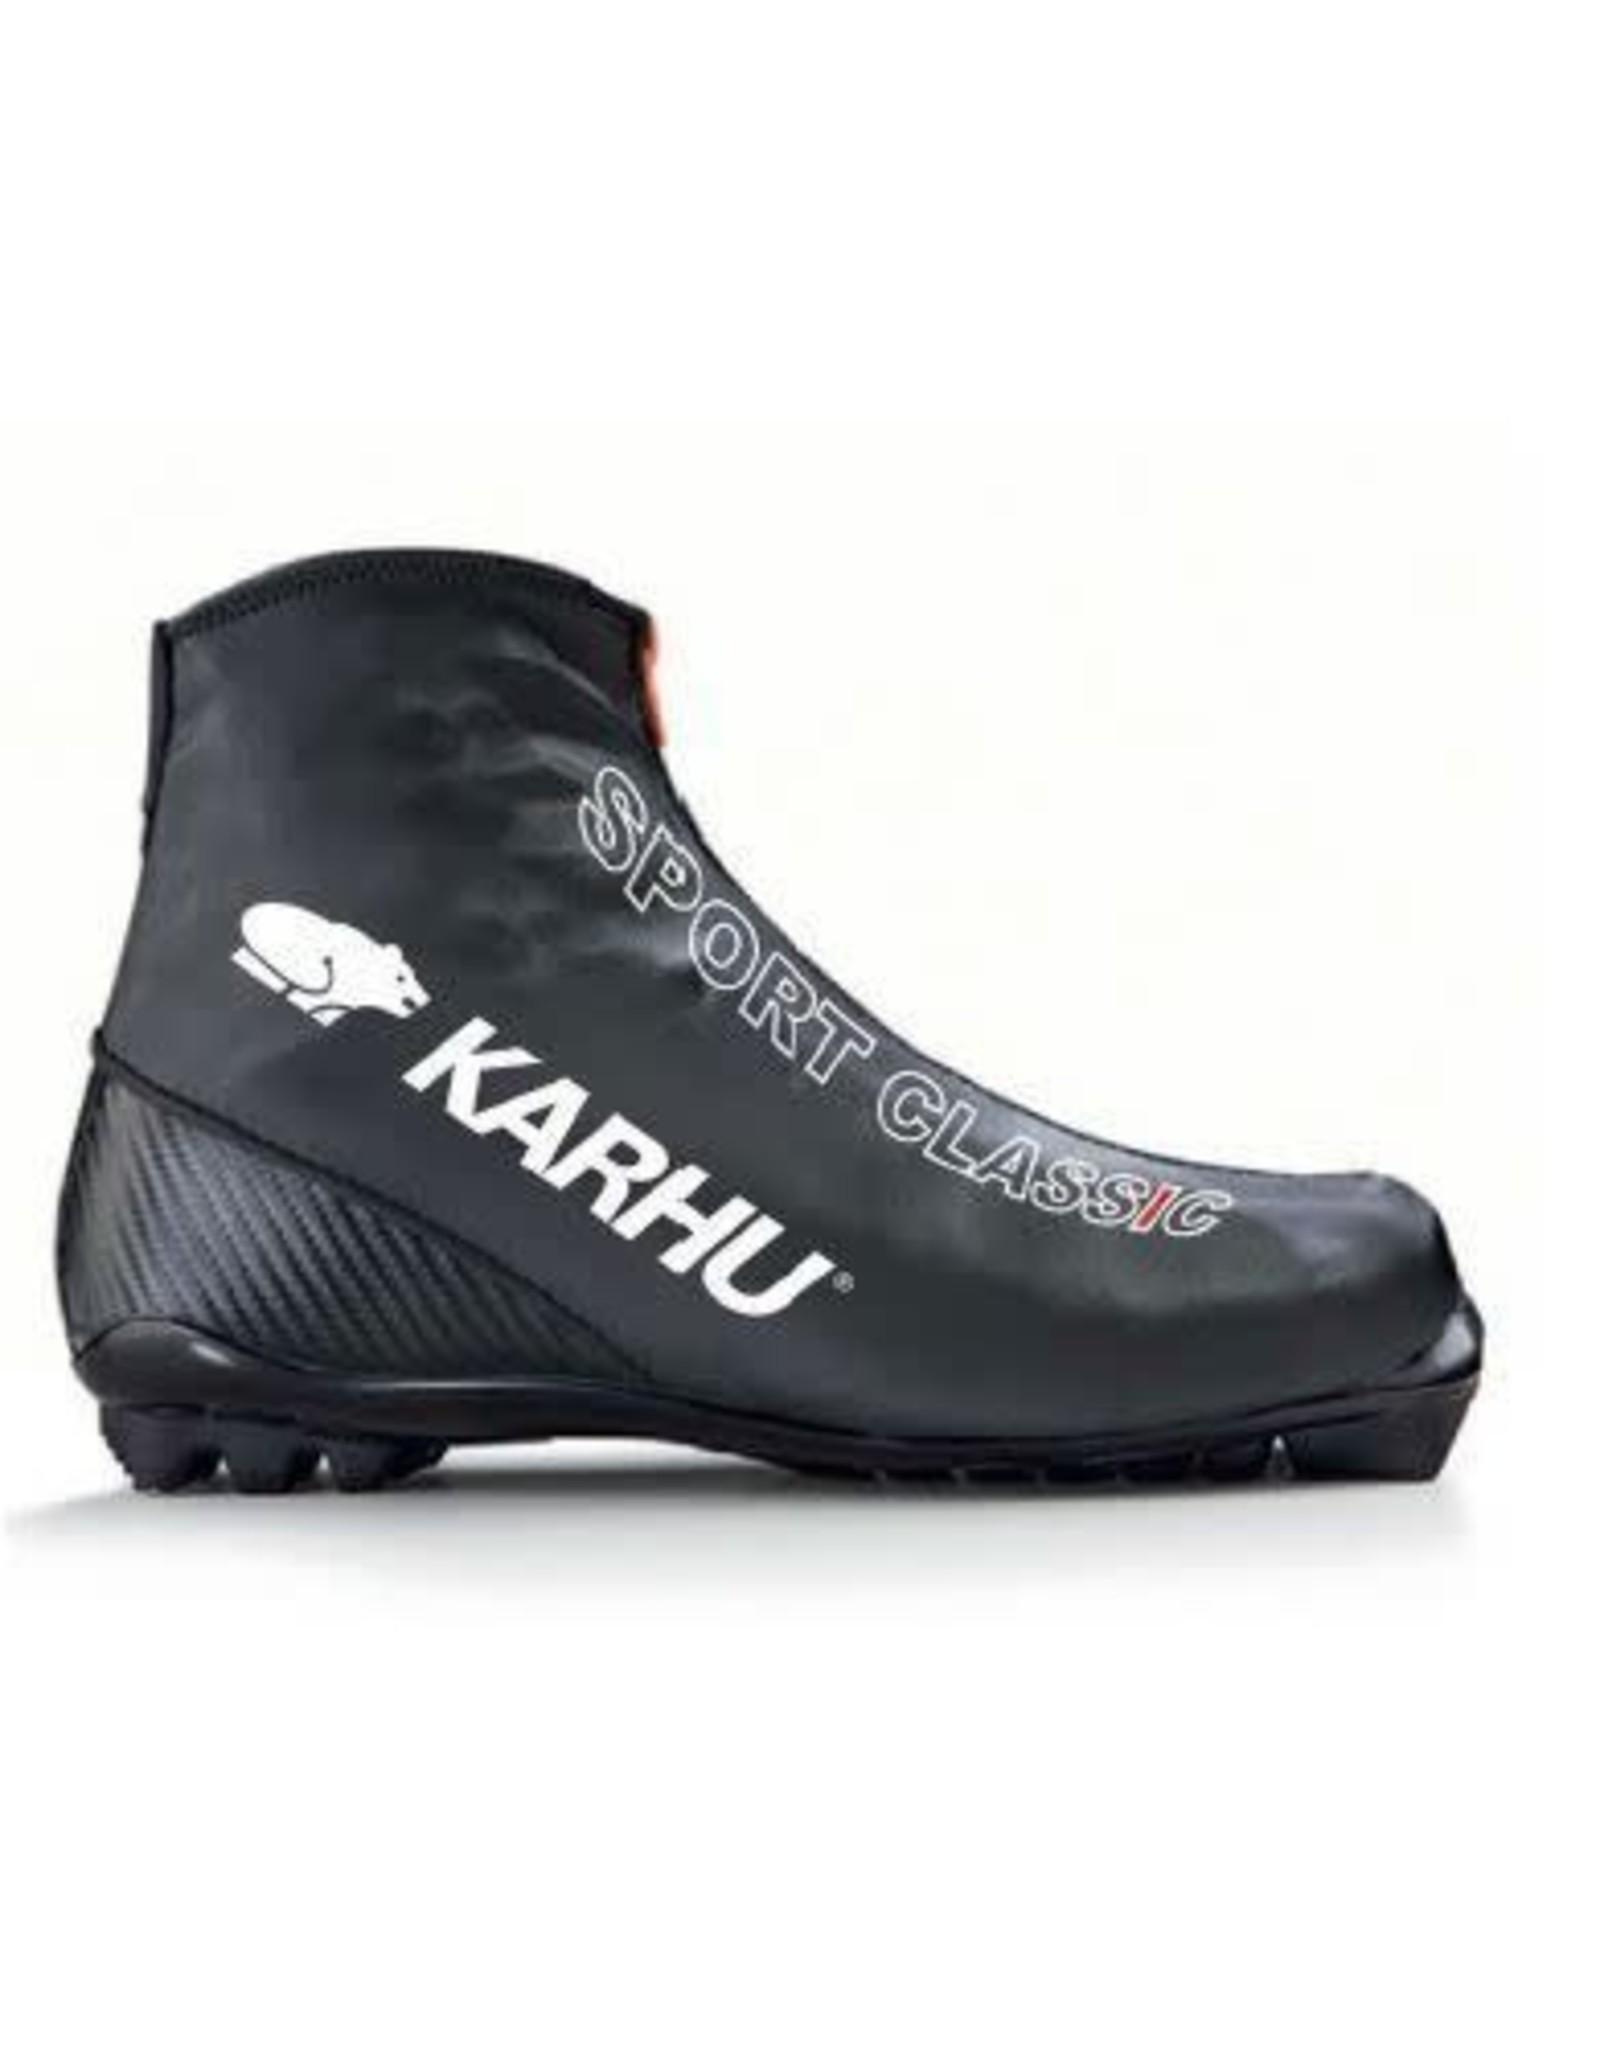 Karhu Karhu Sport Classic boot